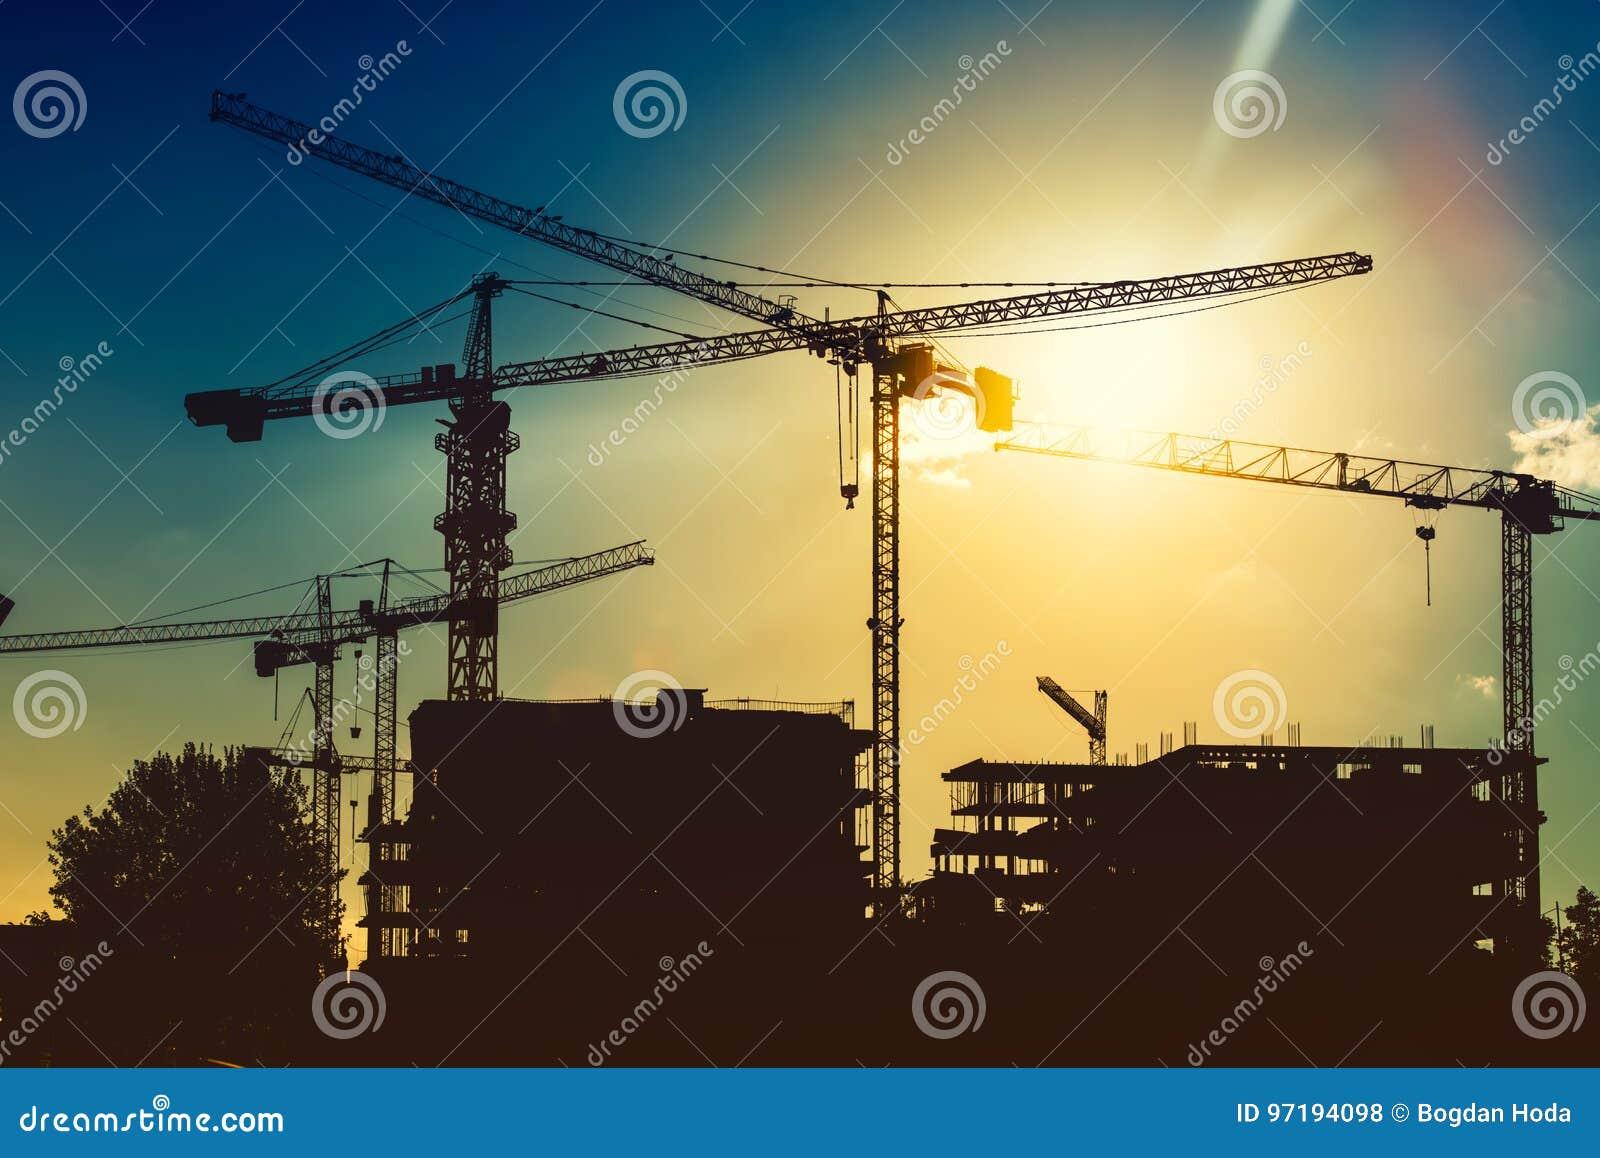 Torenkranen op industriële bouwwerf Nieuwe districtsontwikkeling en de wolkenkrabberbouw